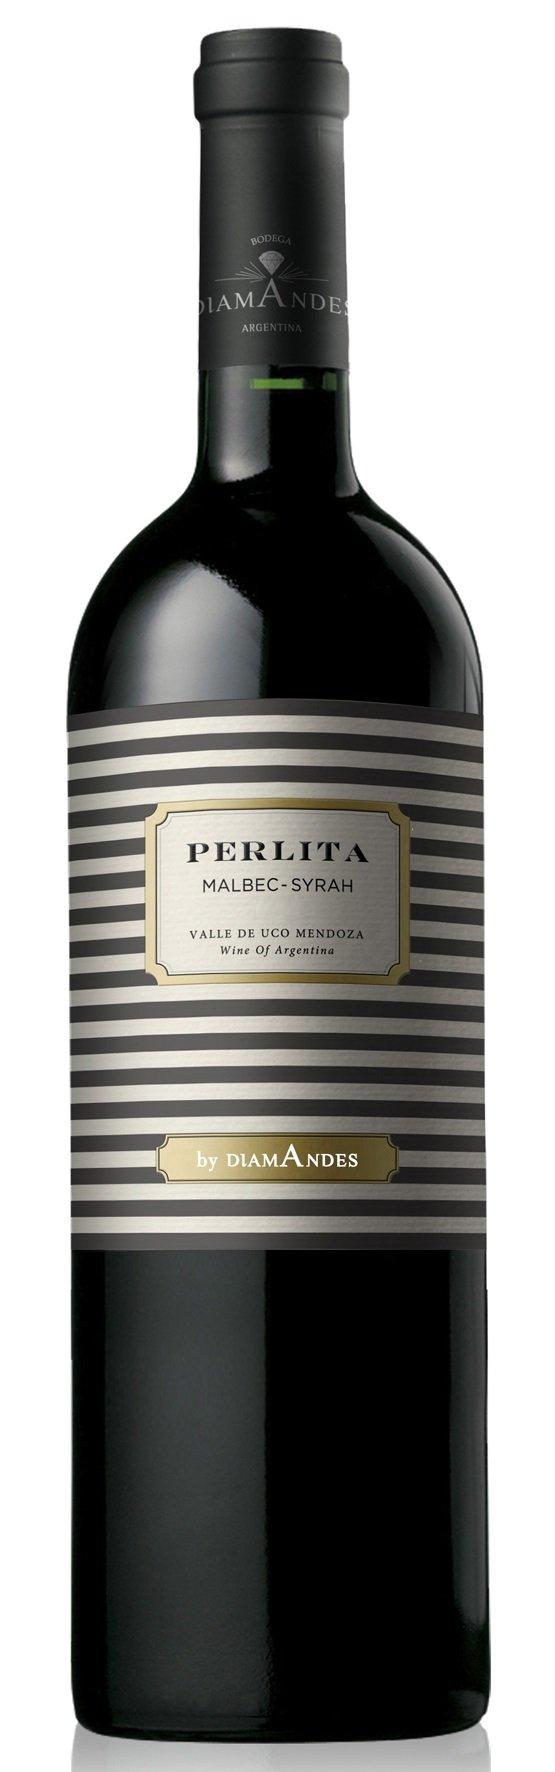 6x-075l-2016er-Bodega-DiamAndes-Perlita-Malbec-Syrah-Mendoza-Argentinien-Rotwein-trocken